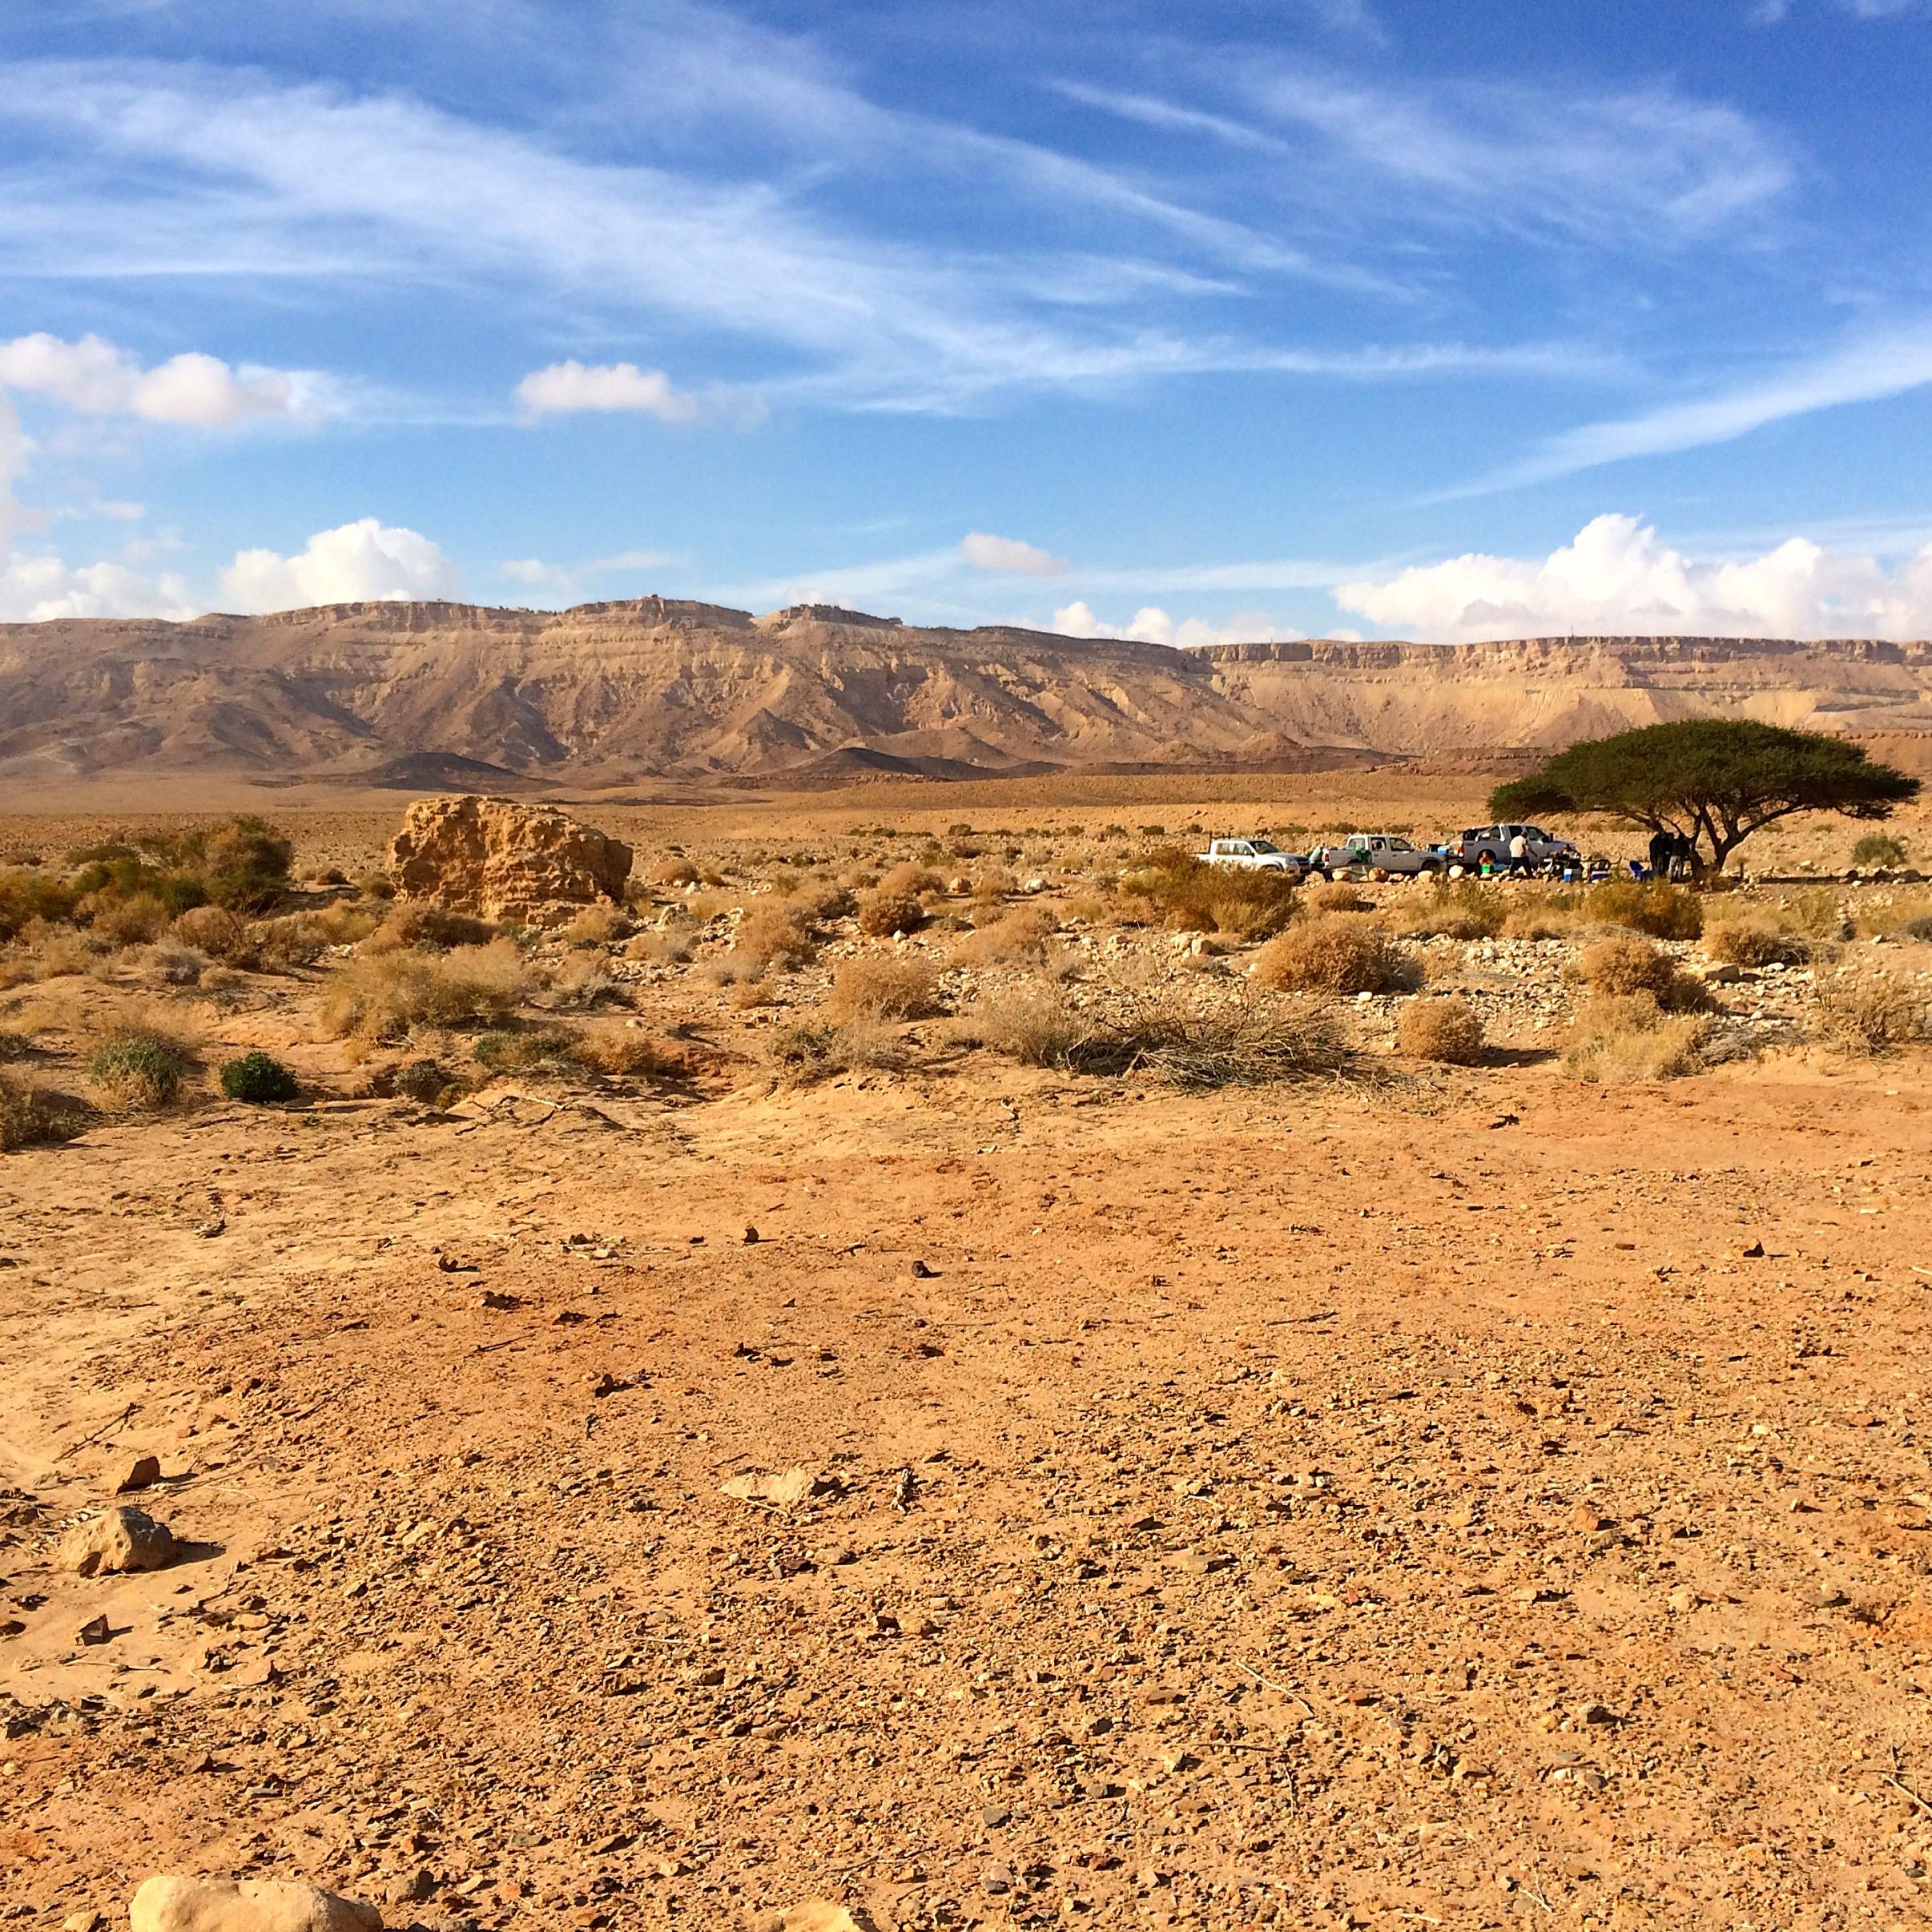 Trekking through the Israeli Desert in Mitzpe Ramon.